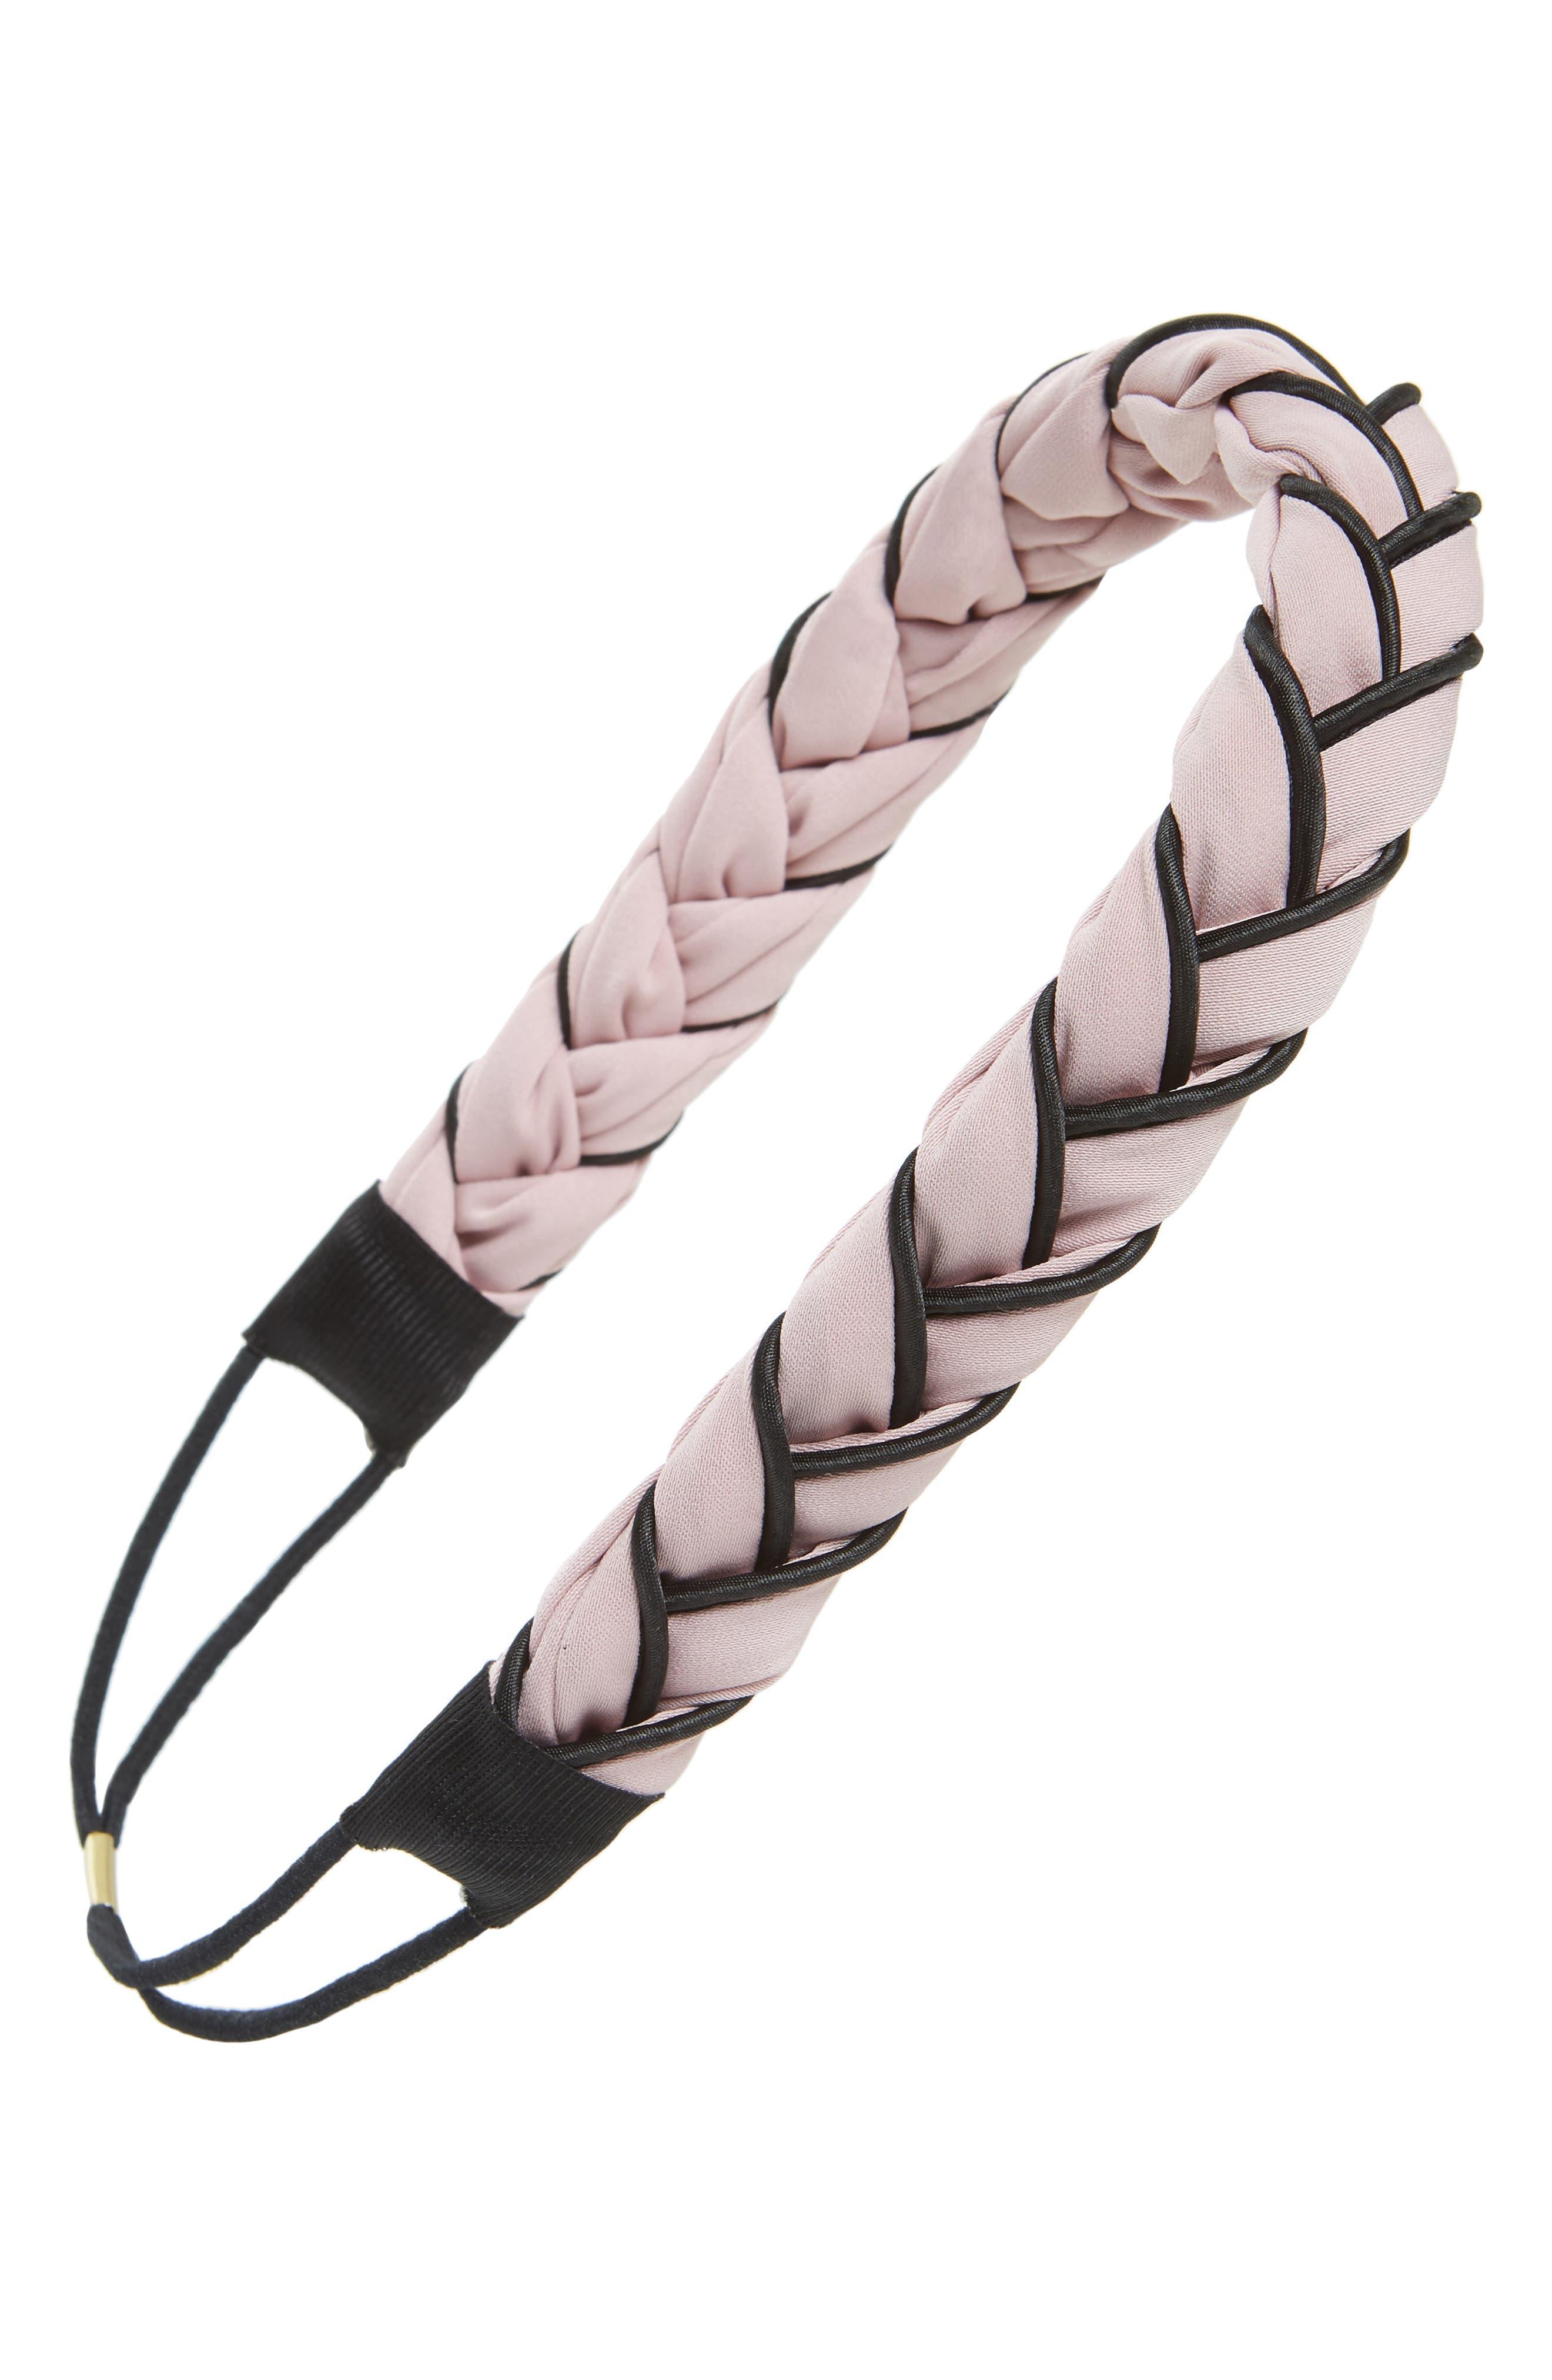 Twist Wrap Fabric Headband,                             Main thumbnail 1, color,                             Pink